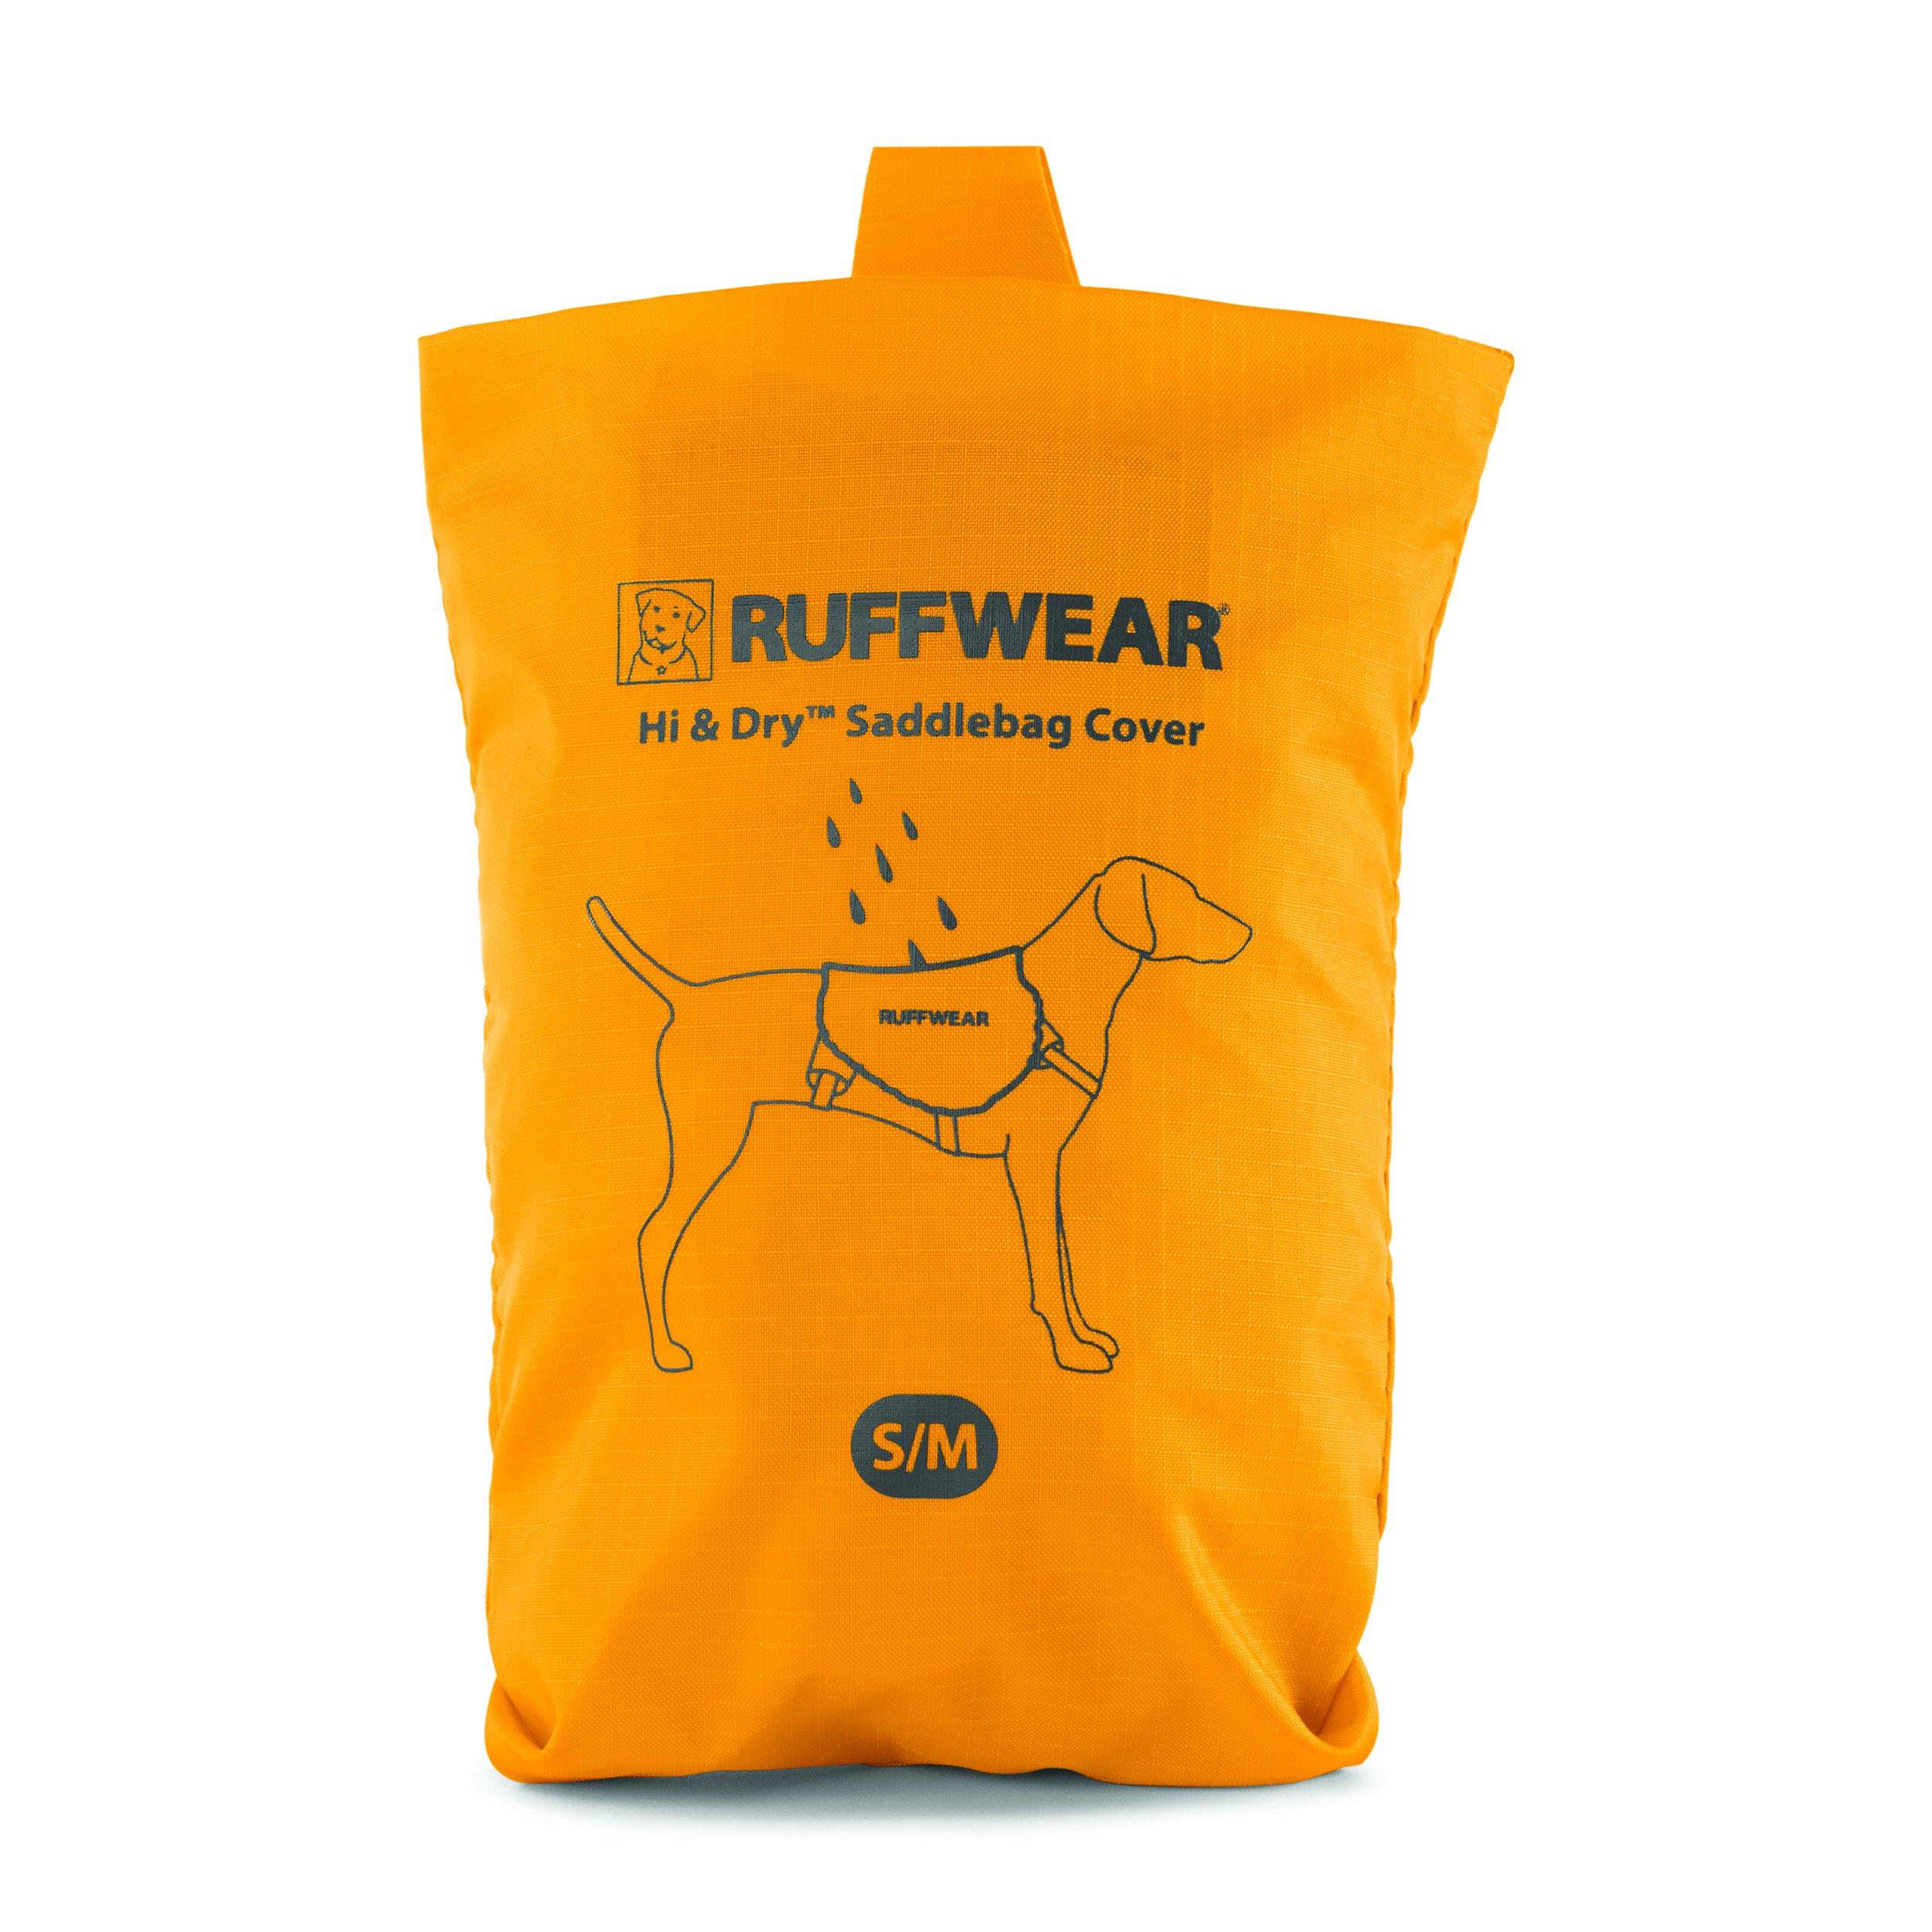 RUFFWEAR - Hi & Dry Saddlebag Cover, Waterproof Dog Pack Protection, Sunrise Yellow, Large/X-Large